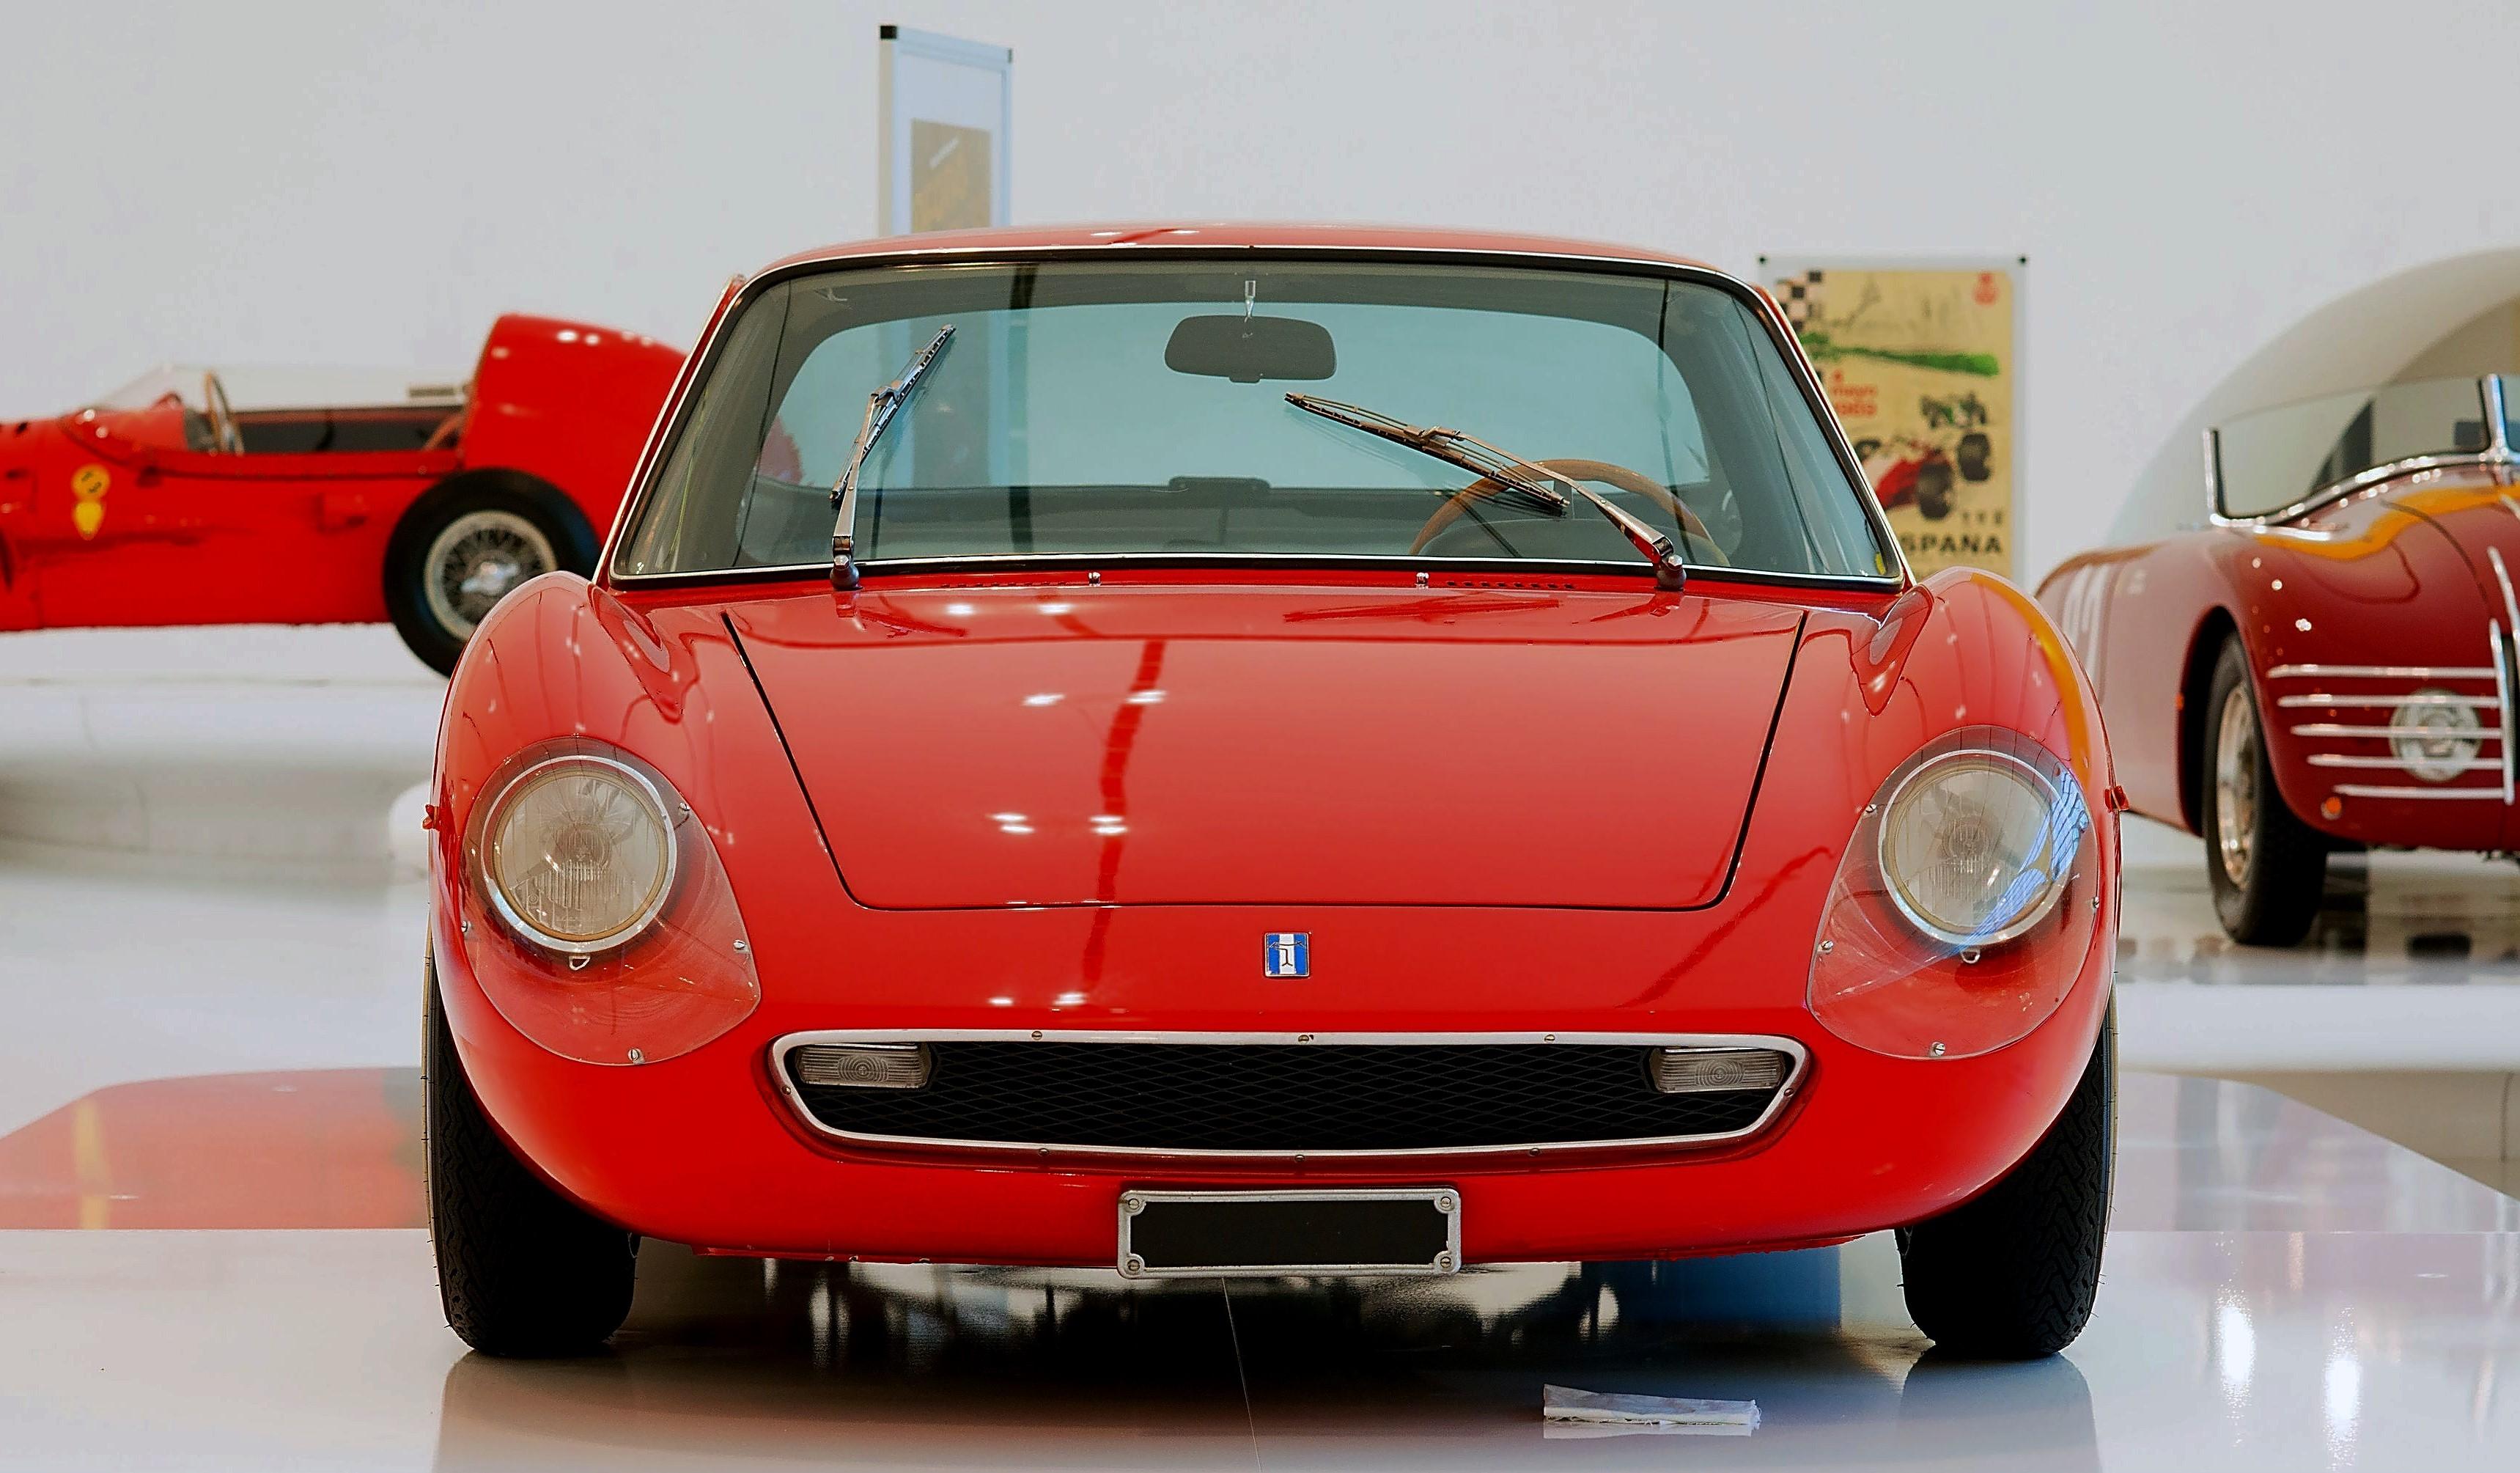 1965 De Tomaso Vallelunga (5)_filtered